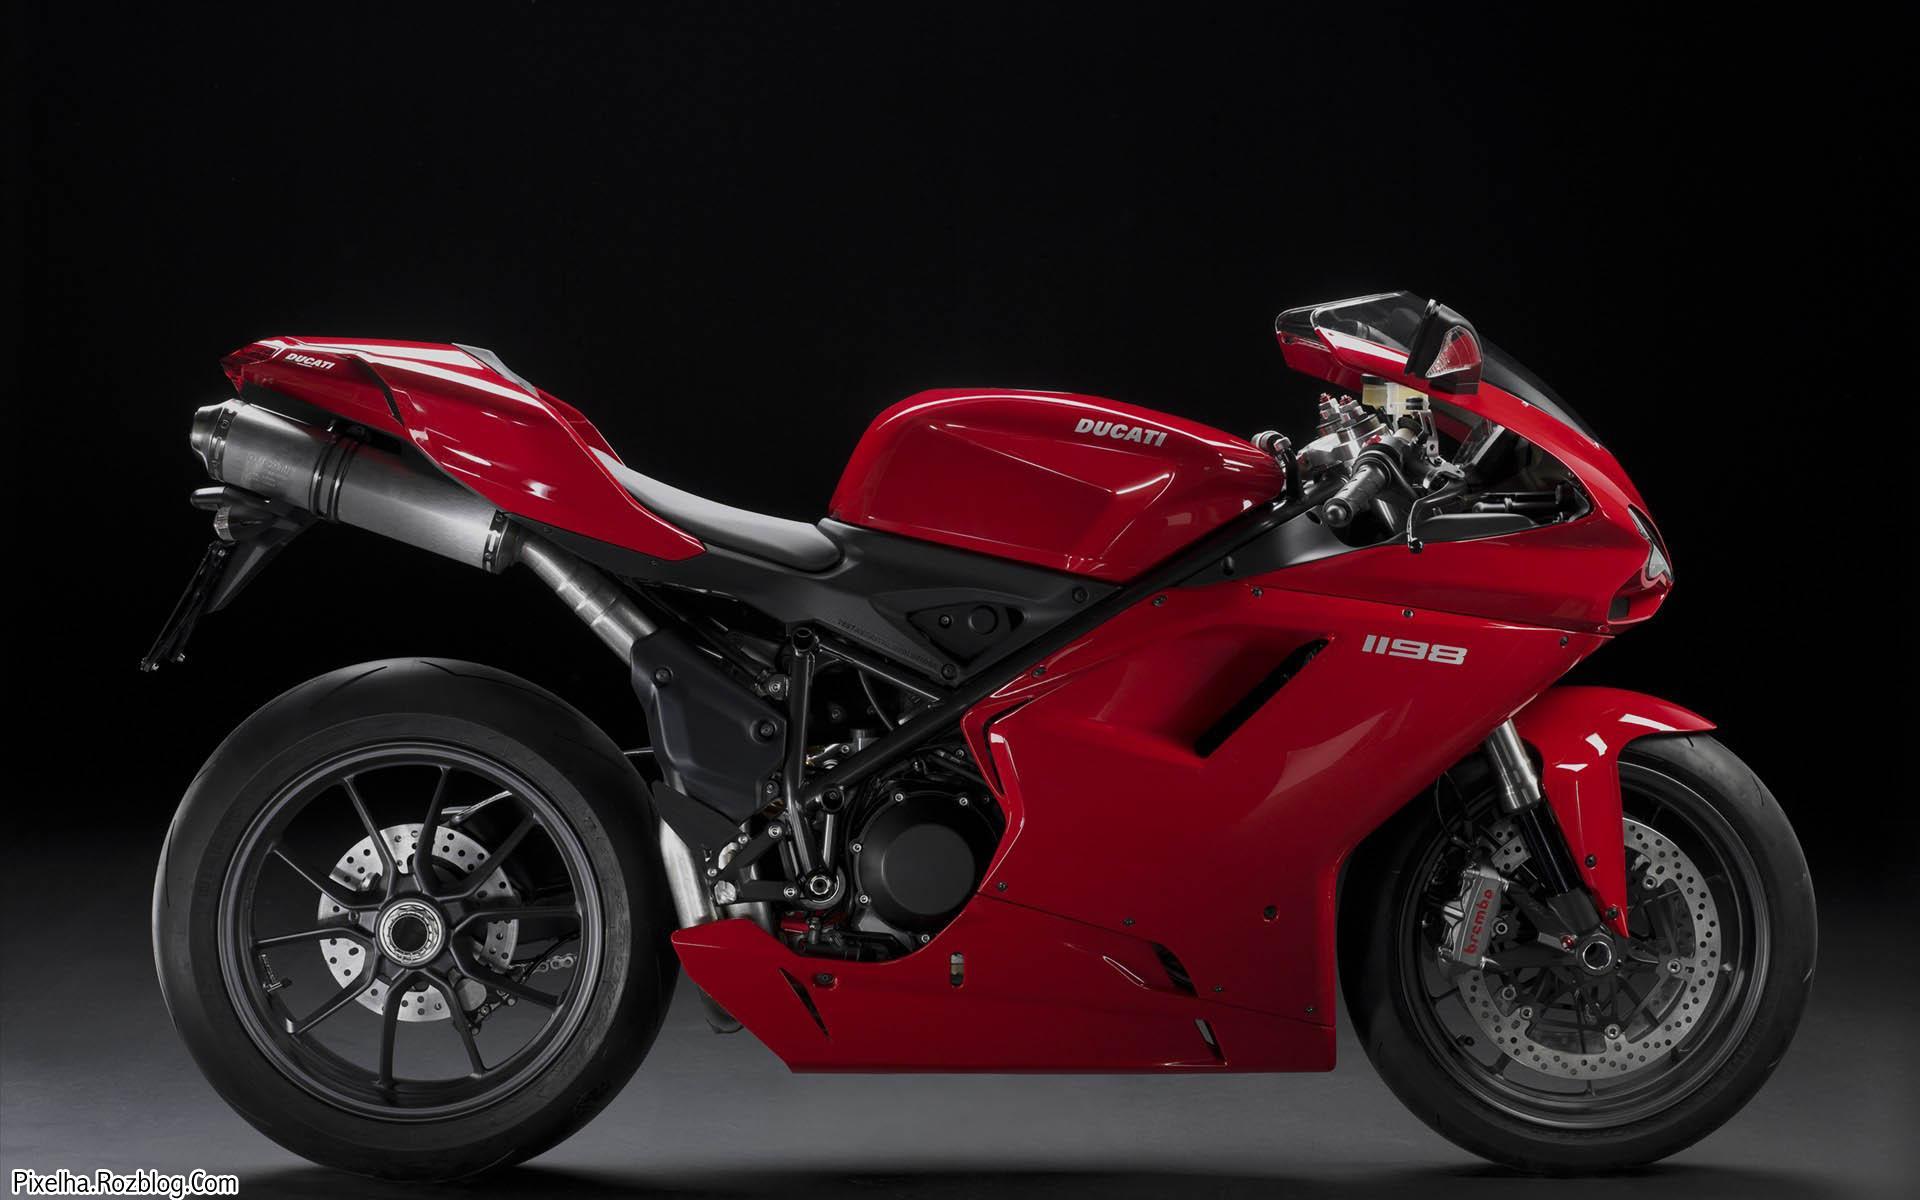 موتور Ducati 1198